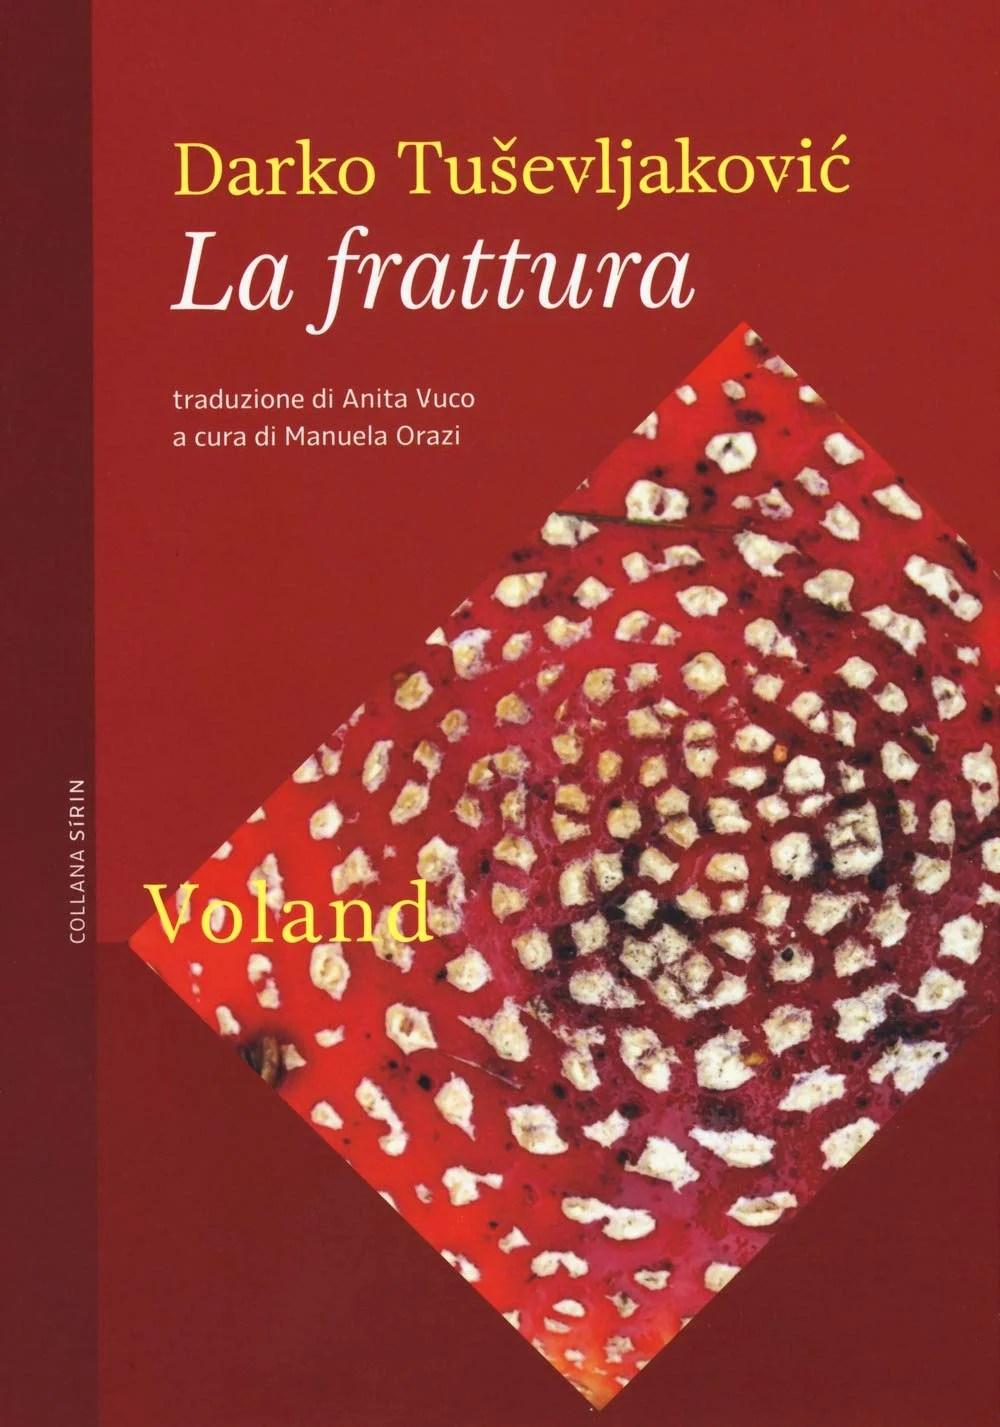 Recensione di La Frattura – Darko Tuševljaković